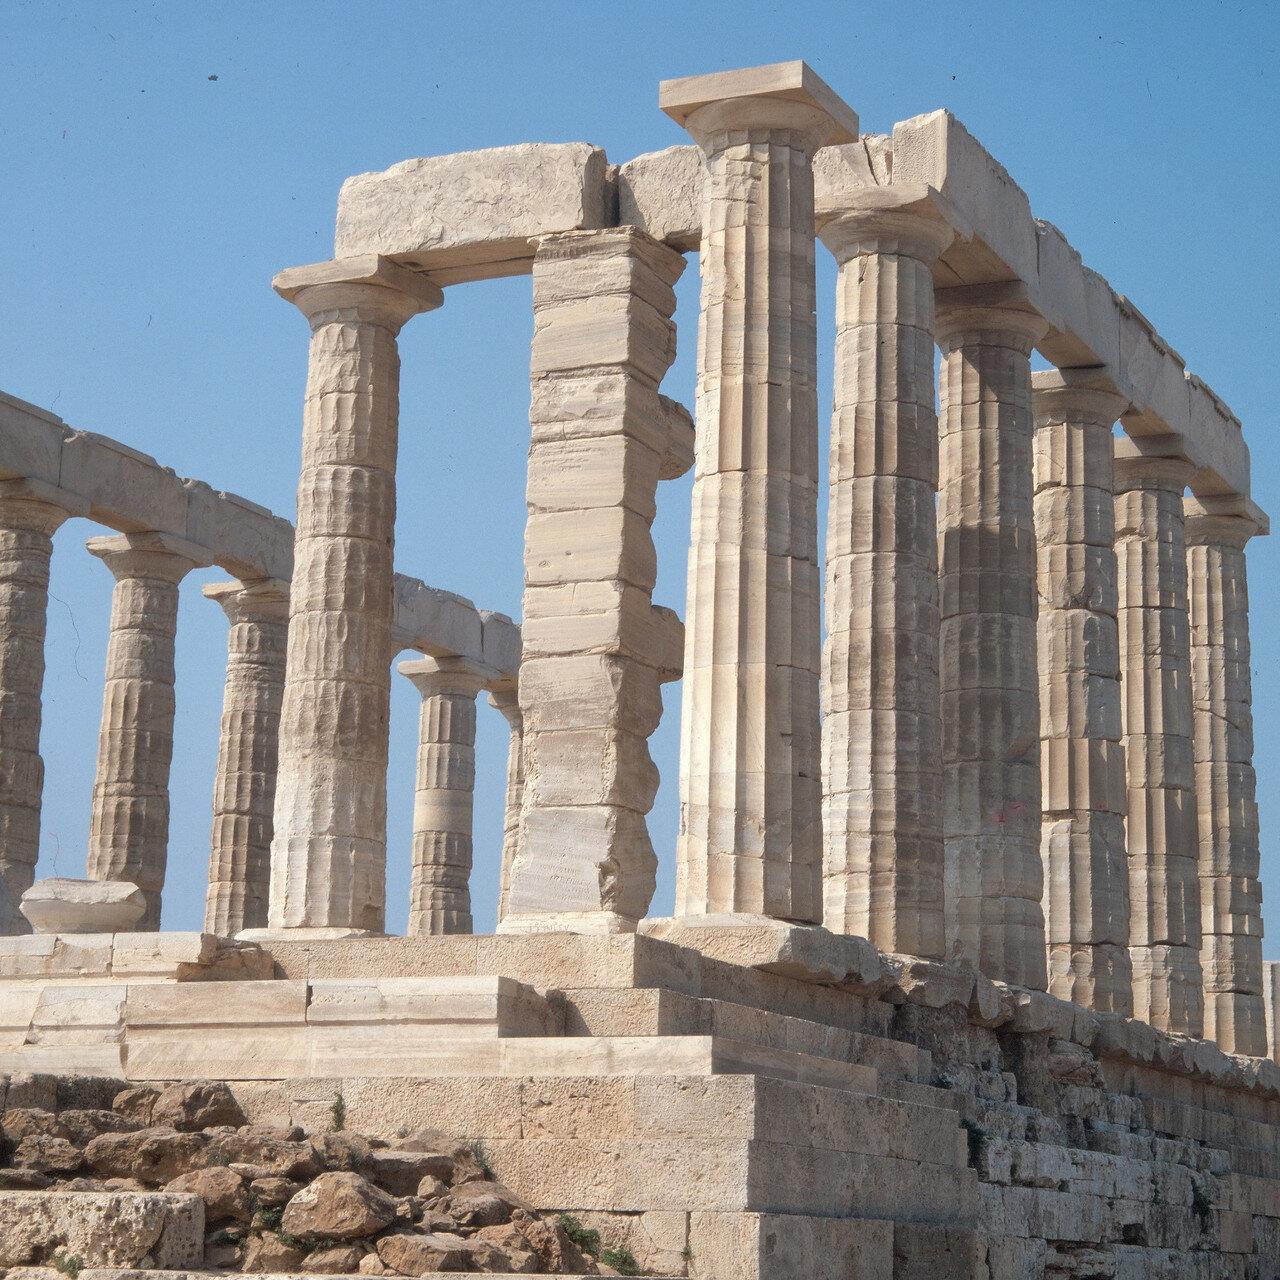 Храм Посейдона. Фундамент храма